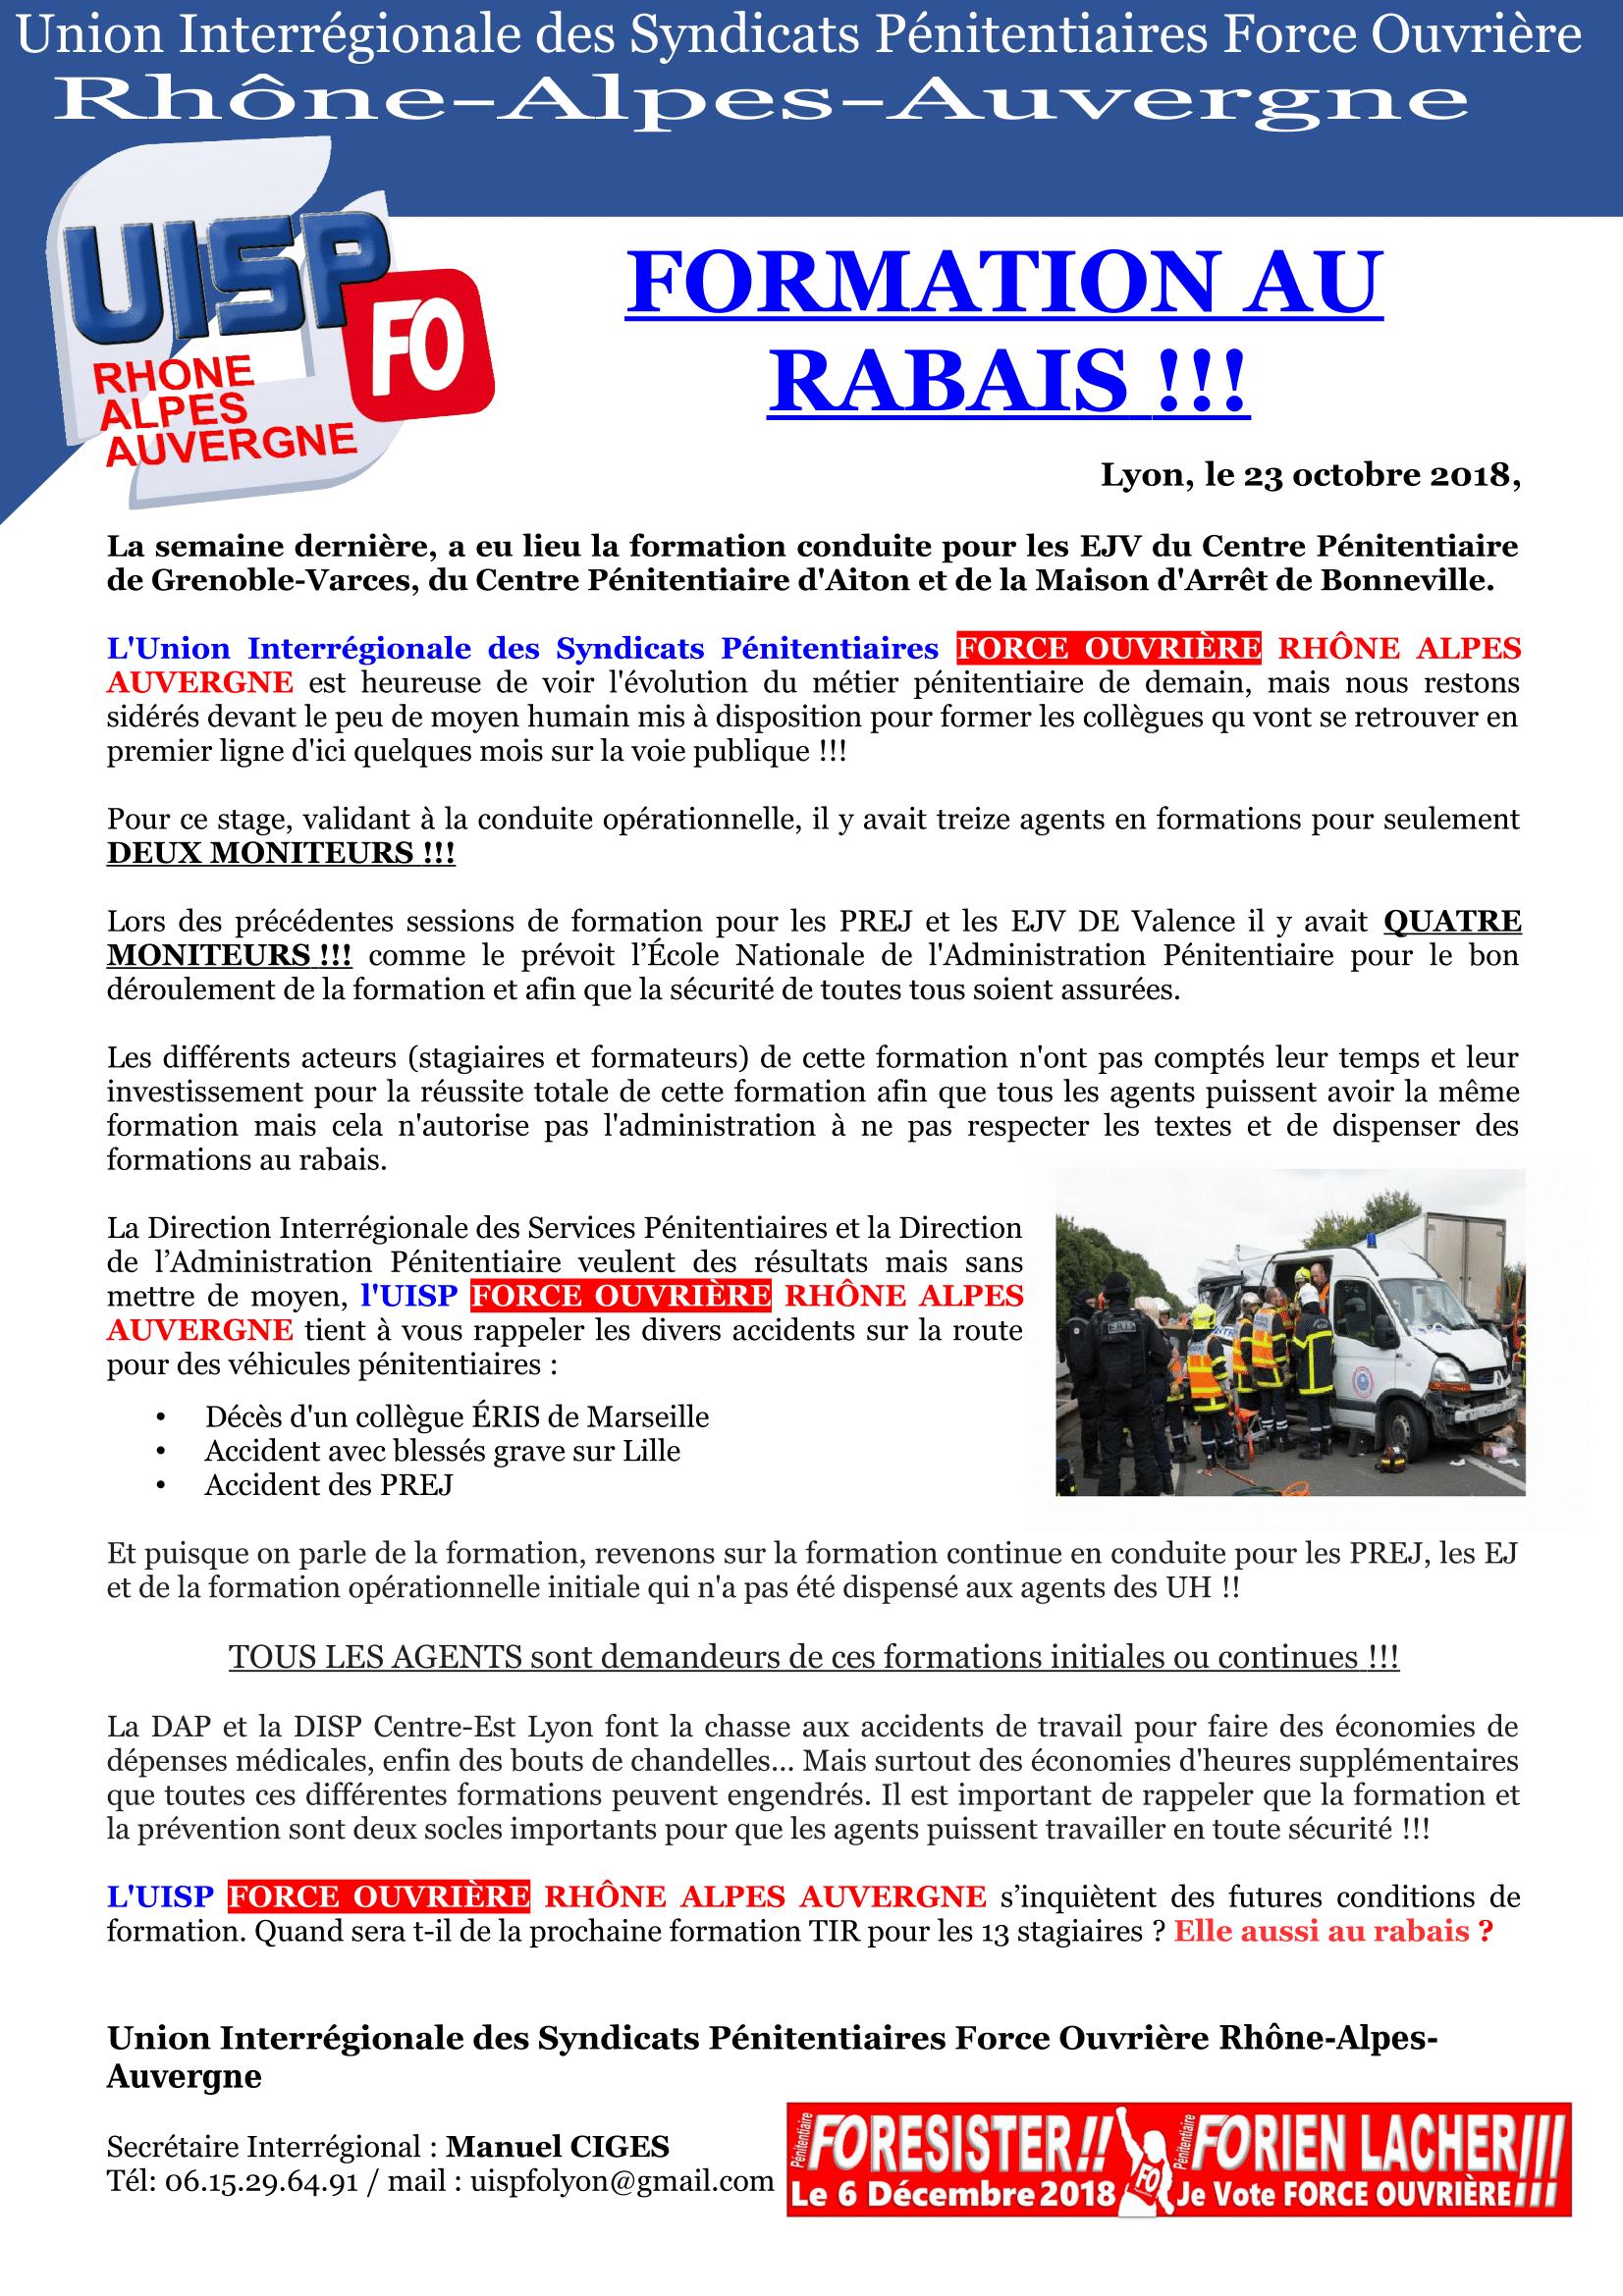 FORMATION AU RABAIS UISP-1